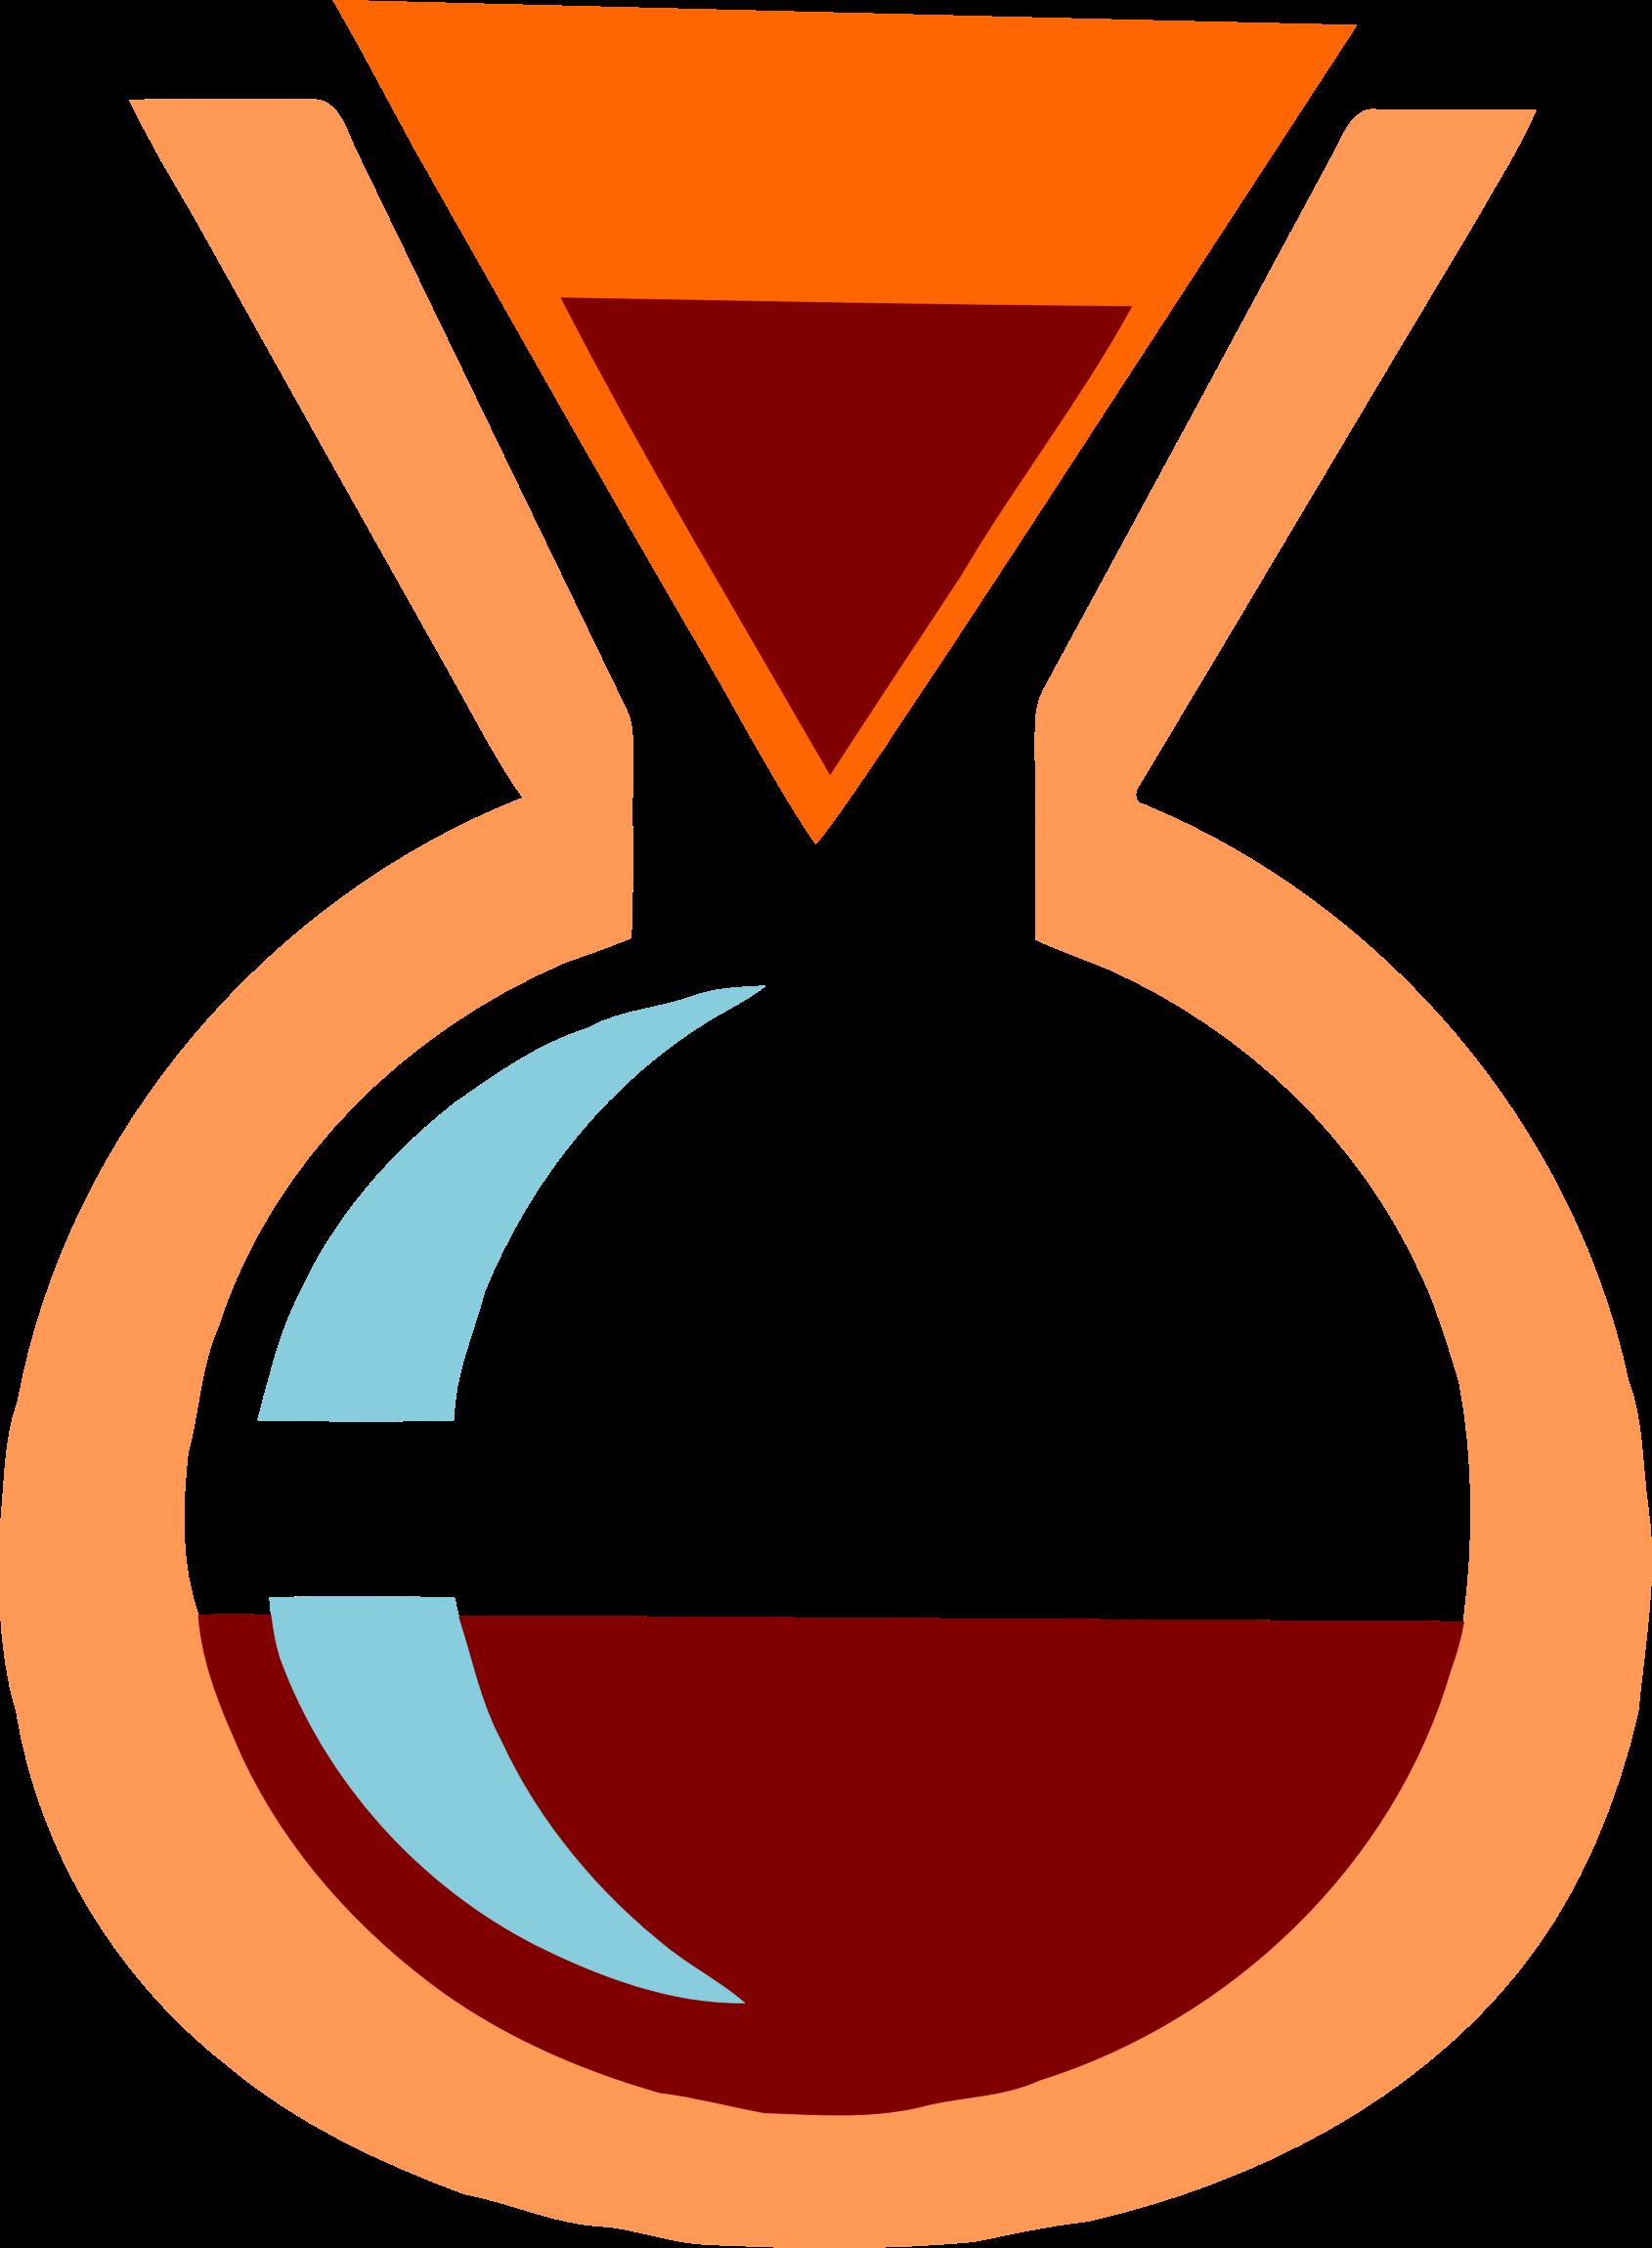 Dust clipart orange. Fixed group chemex style